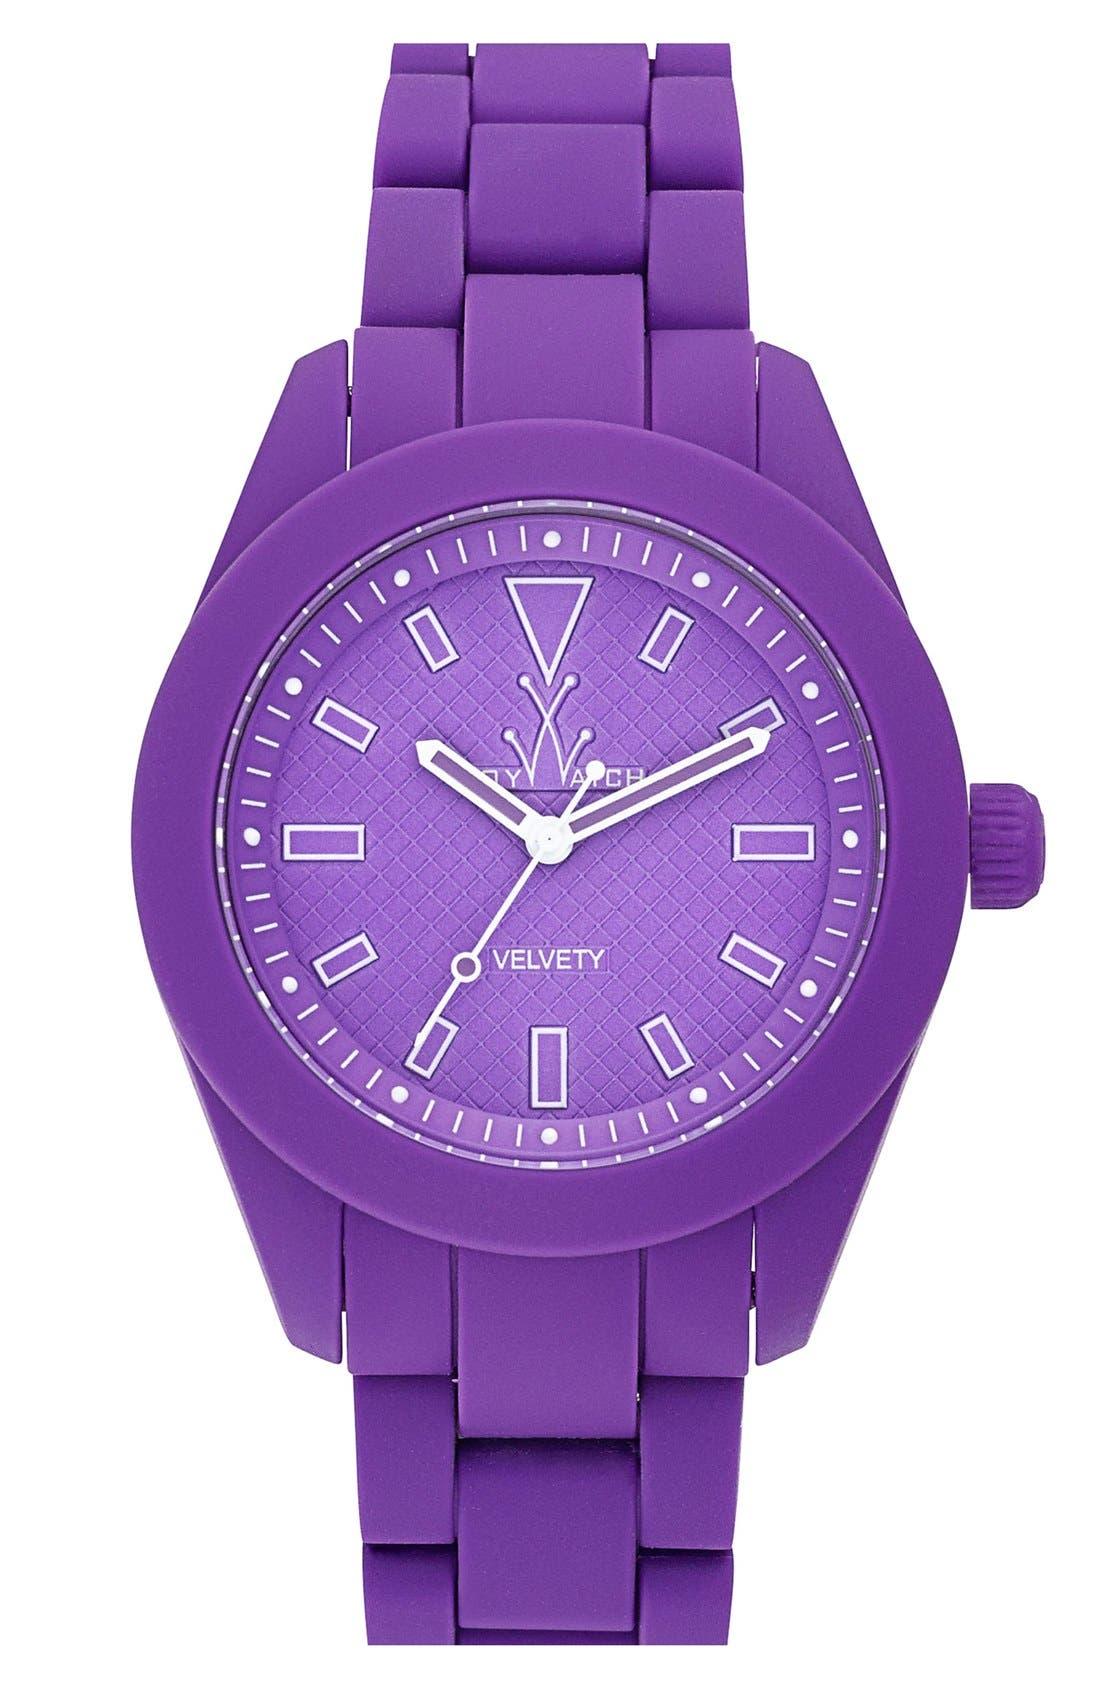 Main Image - TOYWATCH 'Velvety' Bracelet Watch, 41mm